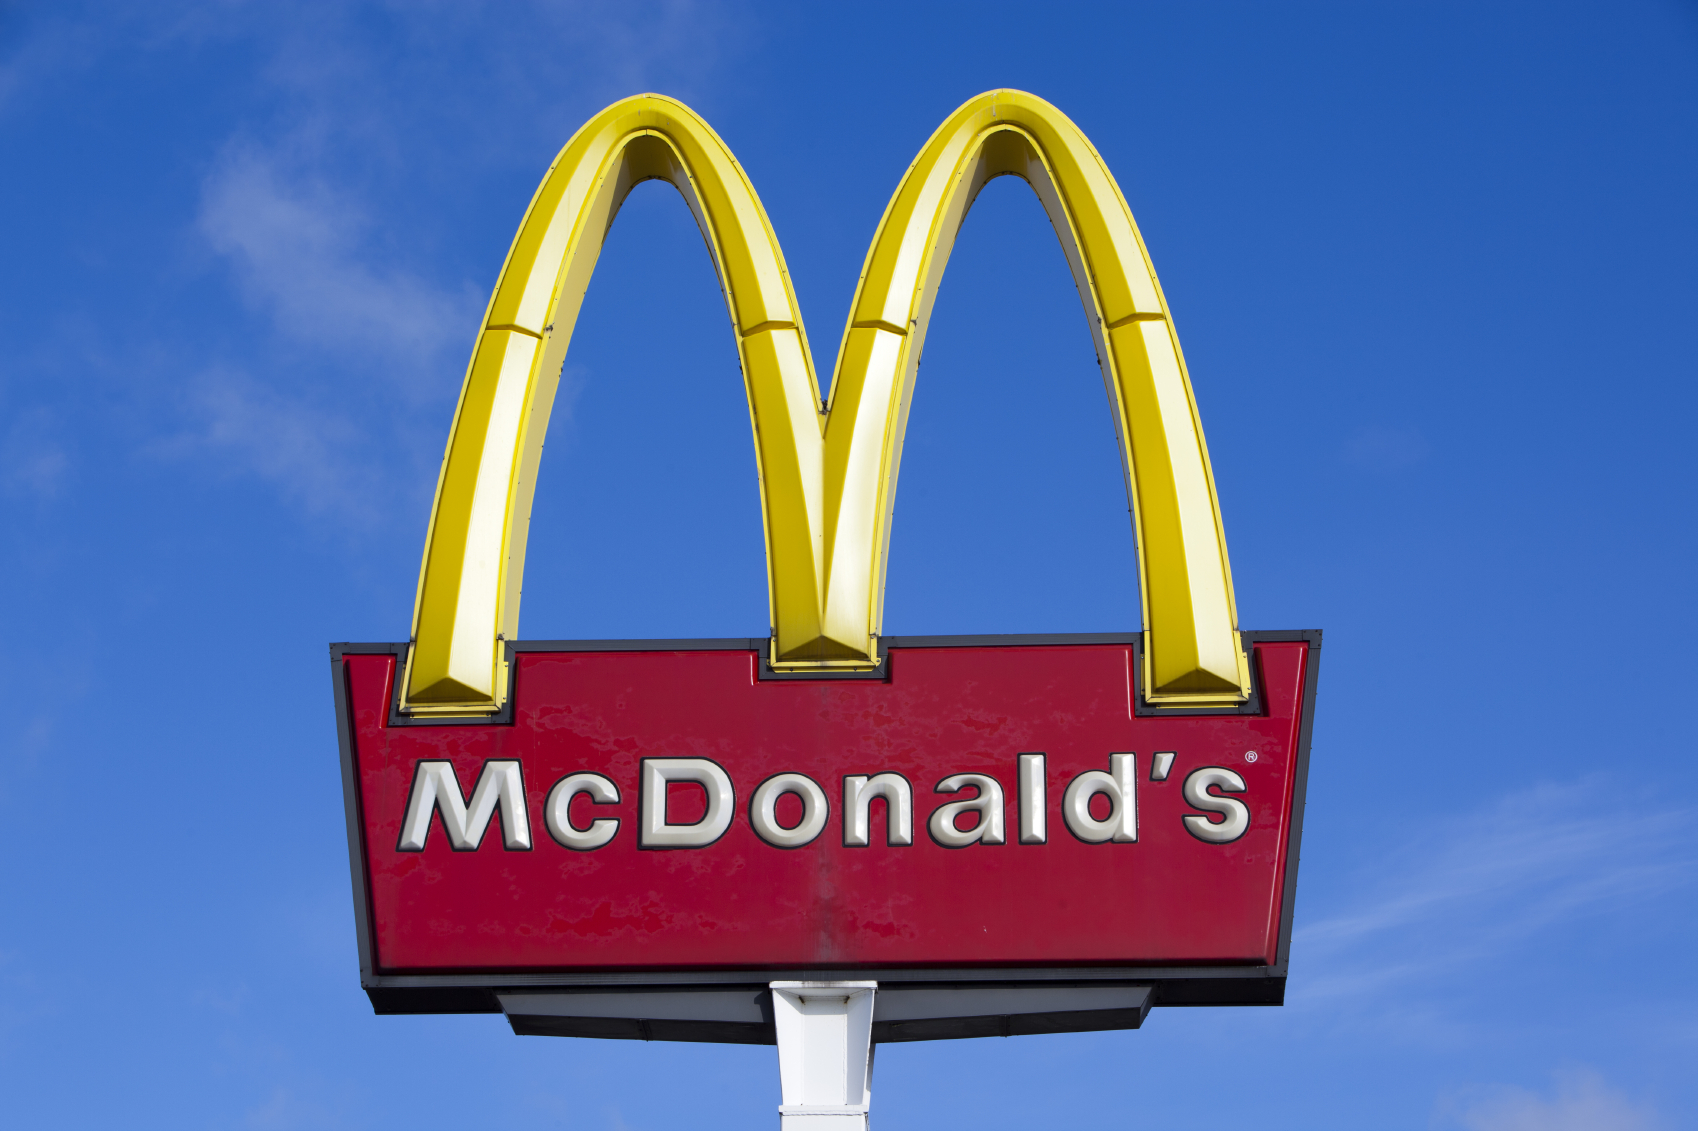 McDonald's logo against blue sky.